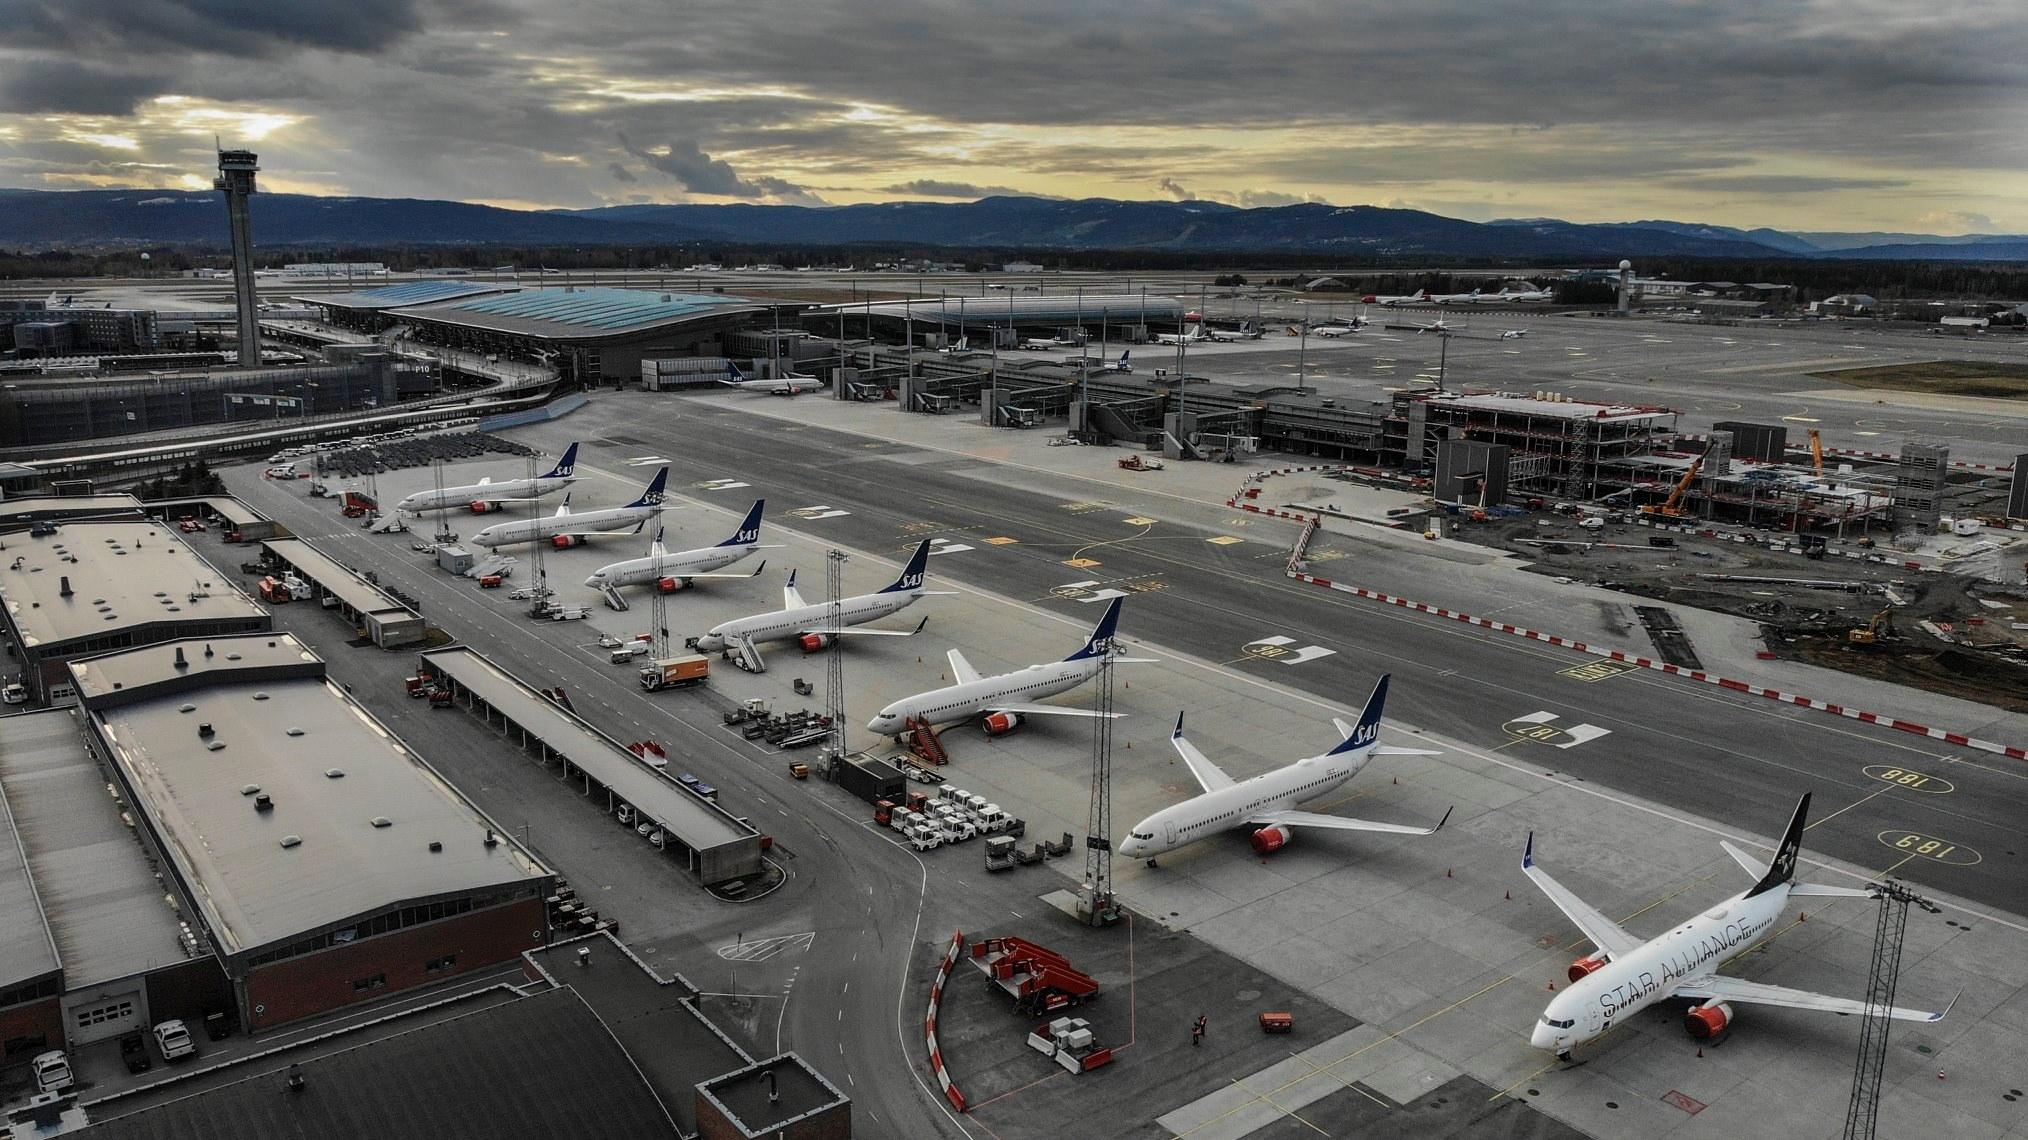 Boeing 737-fly fra SAS parkeret i Oslo Lufthavn under COVID-19-nedlukningen. (Foto: Avinor)